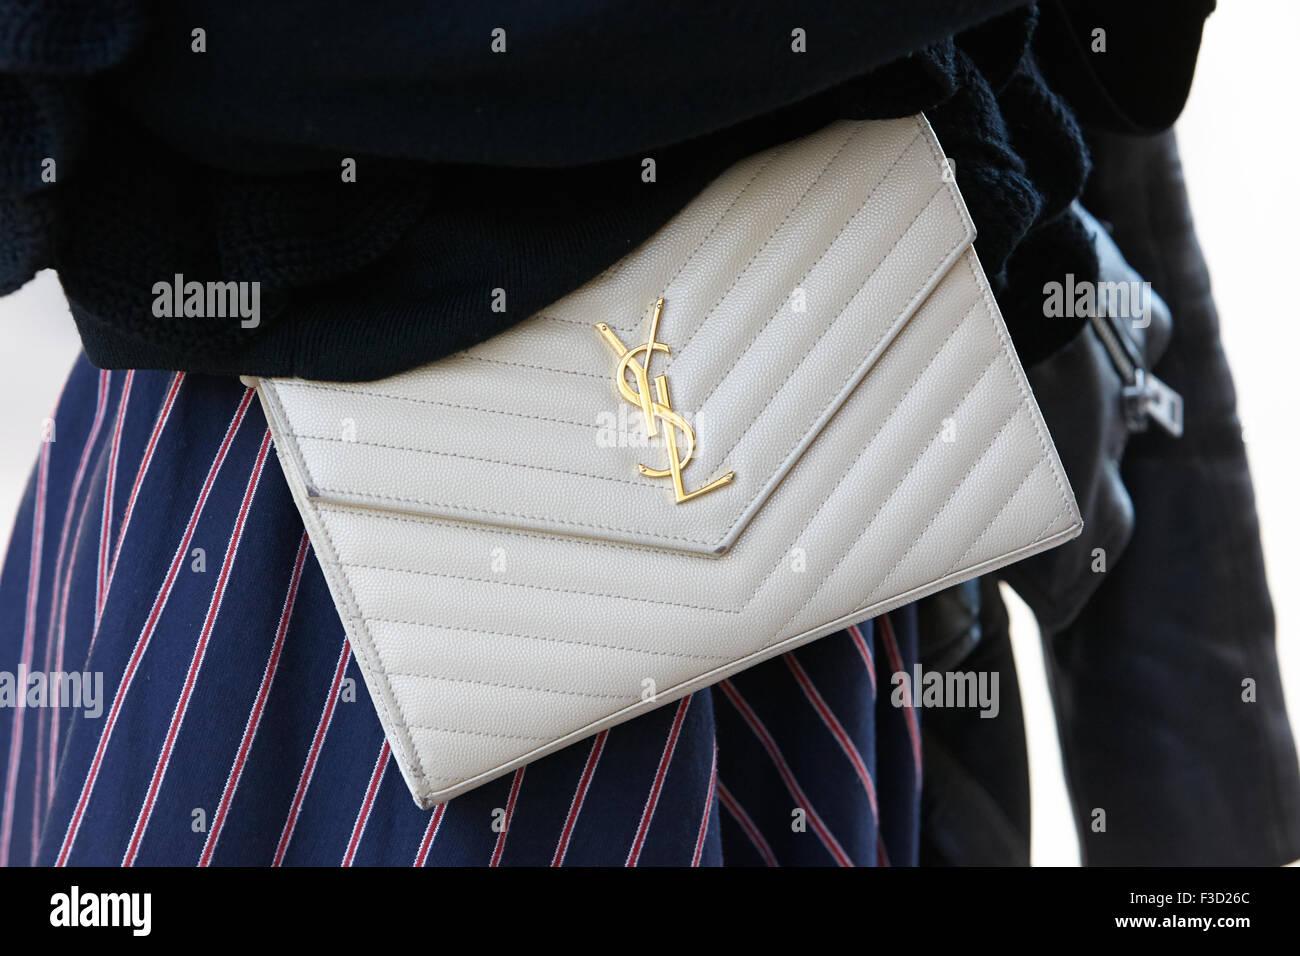 Yves Saint Laurent Bag Before Rochas Show, Paris Fashion Week Day ...